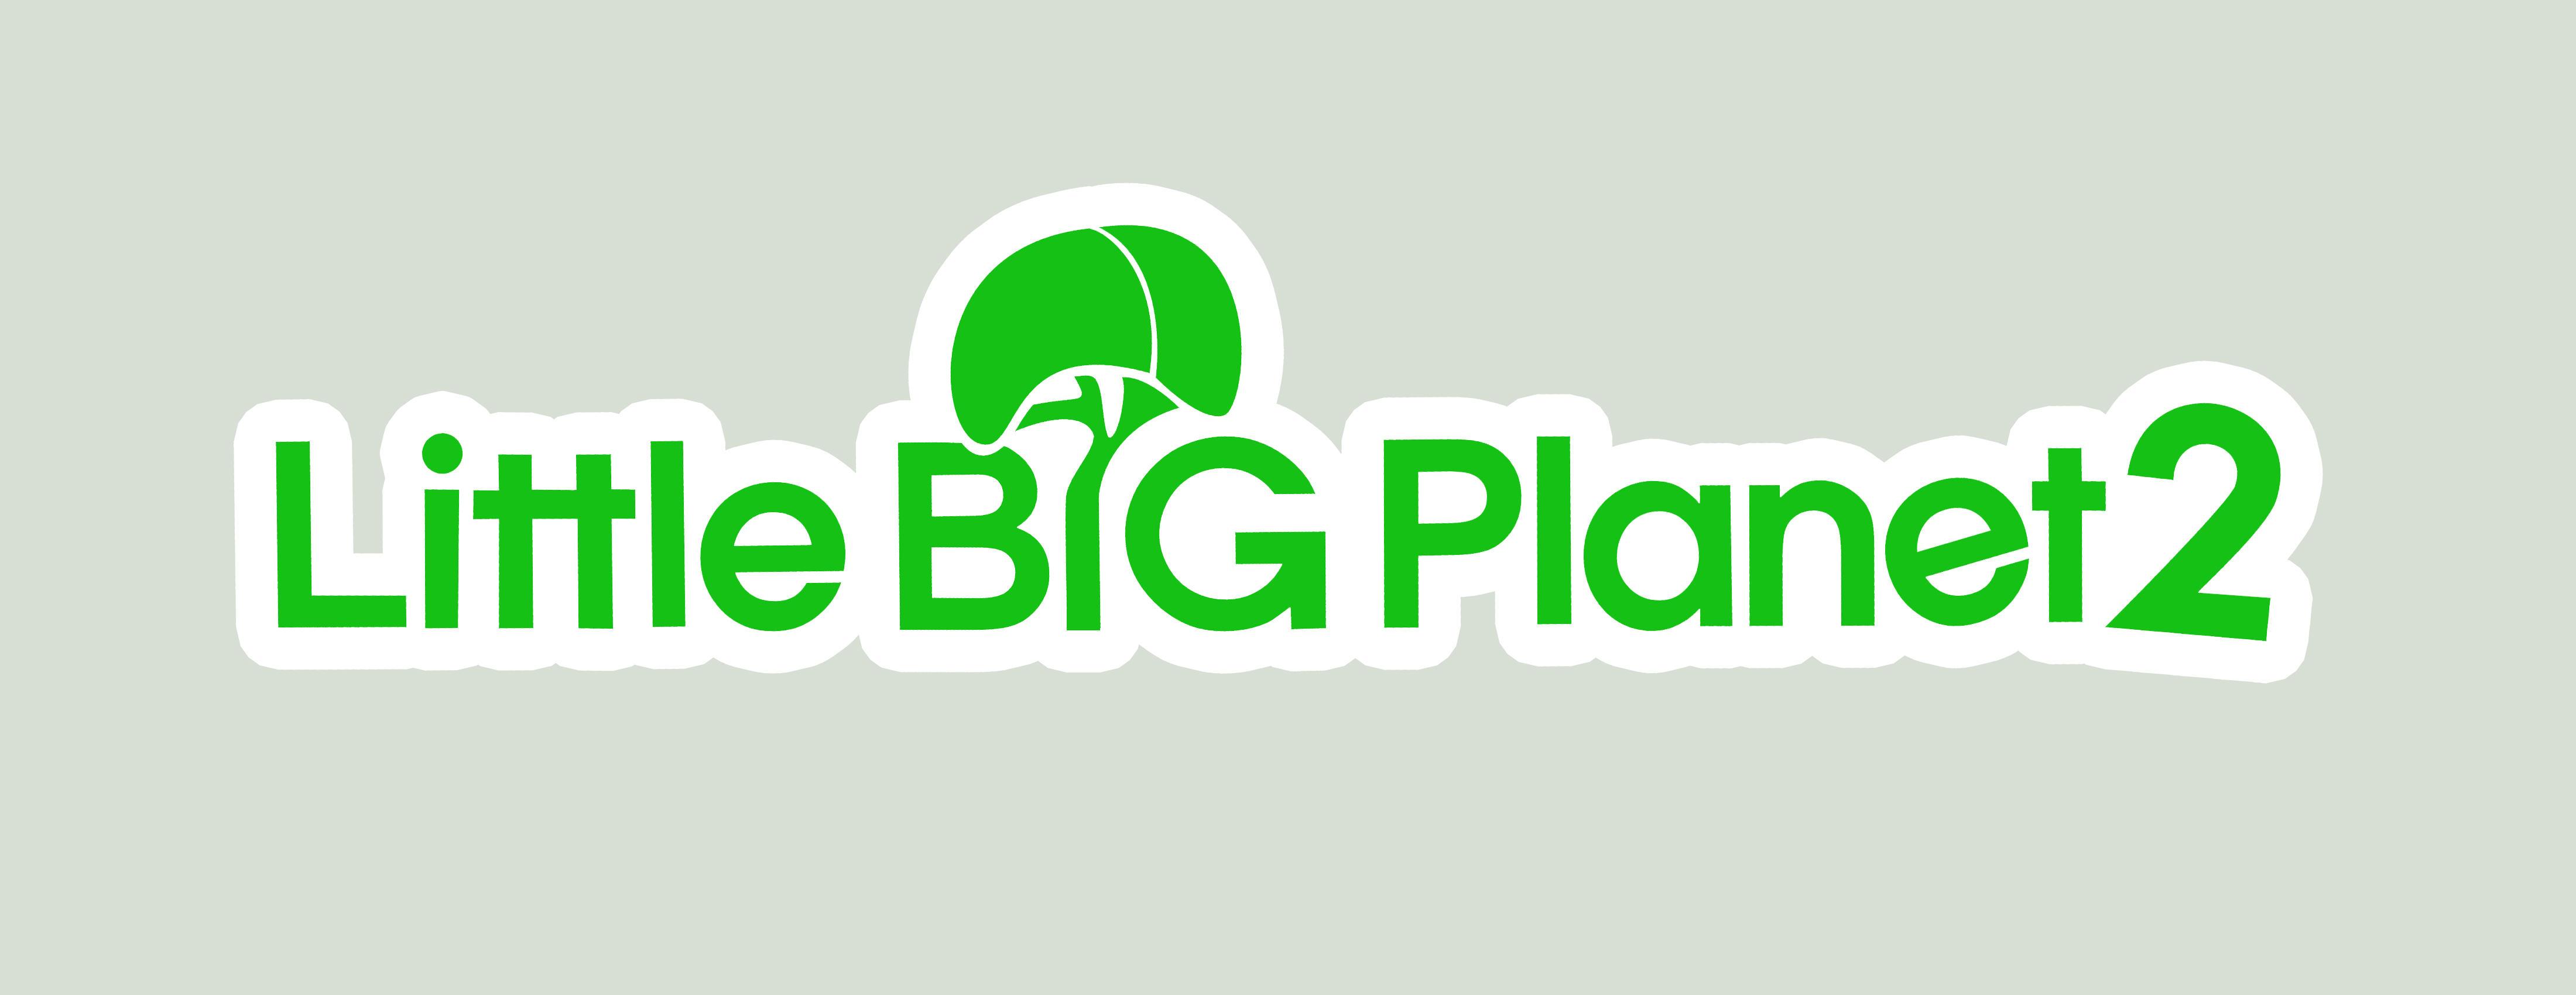 LBP2 Plain Logo HD by metrovinz on DeviantArt